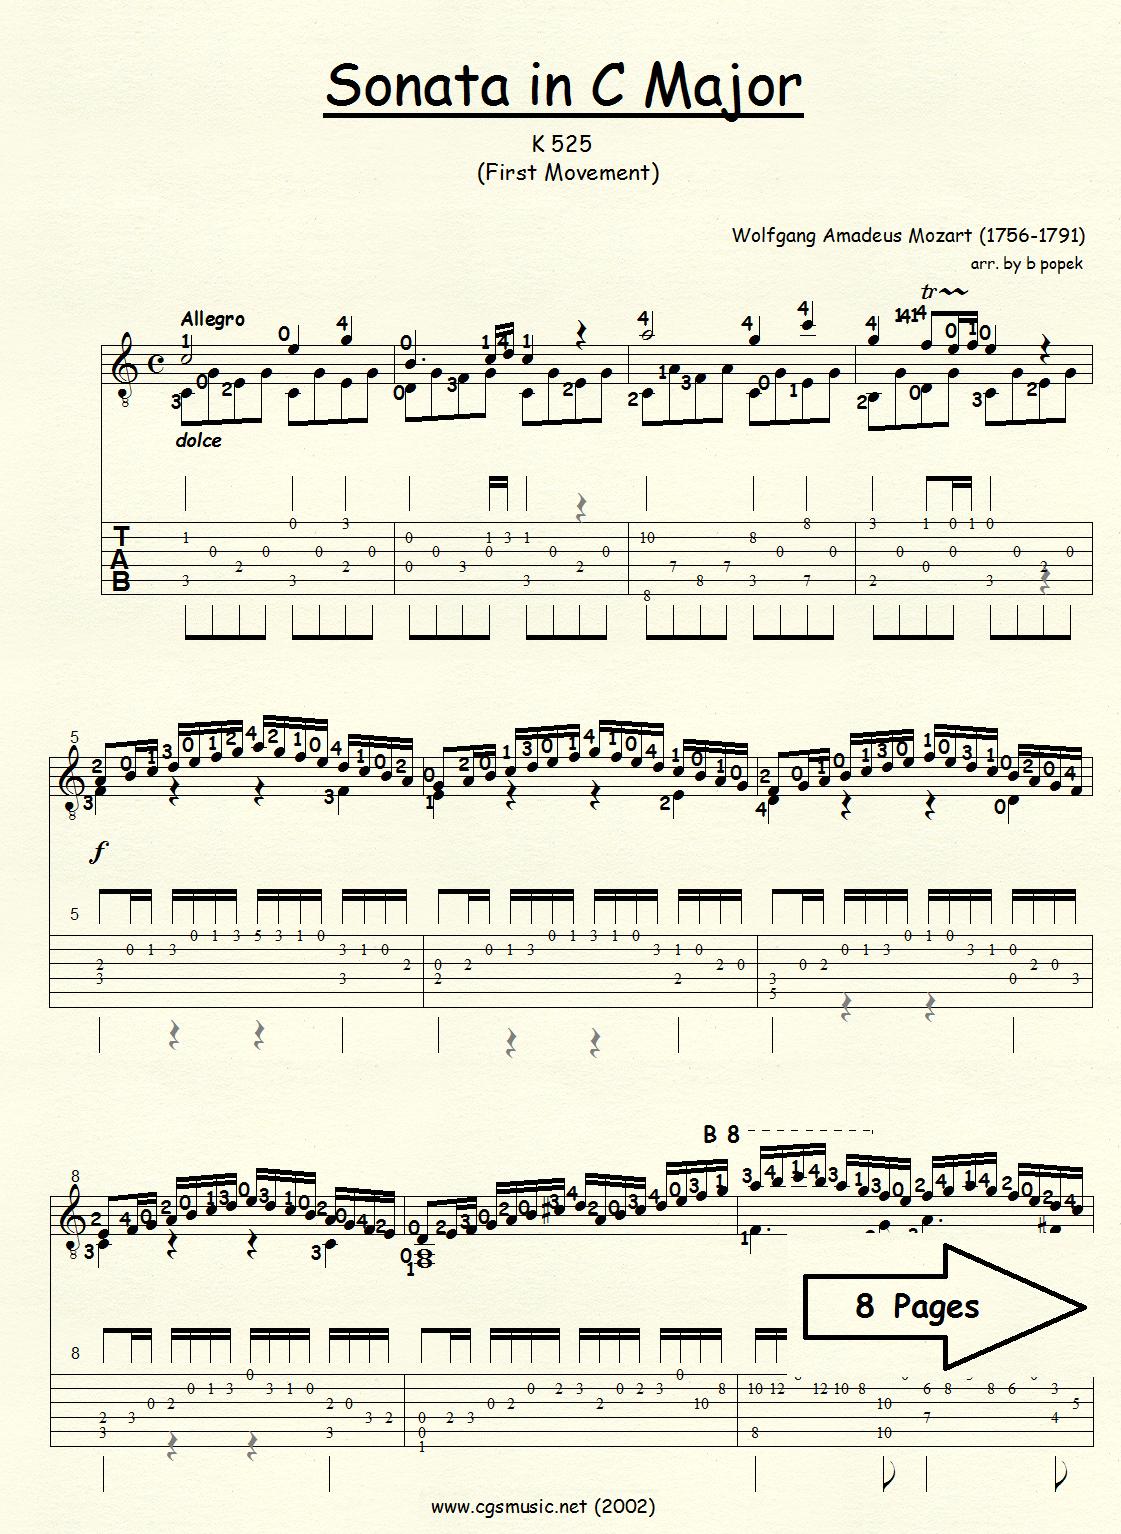 Sonata in C Major K-525 (Mozart) for Classical Guitar in Tablature